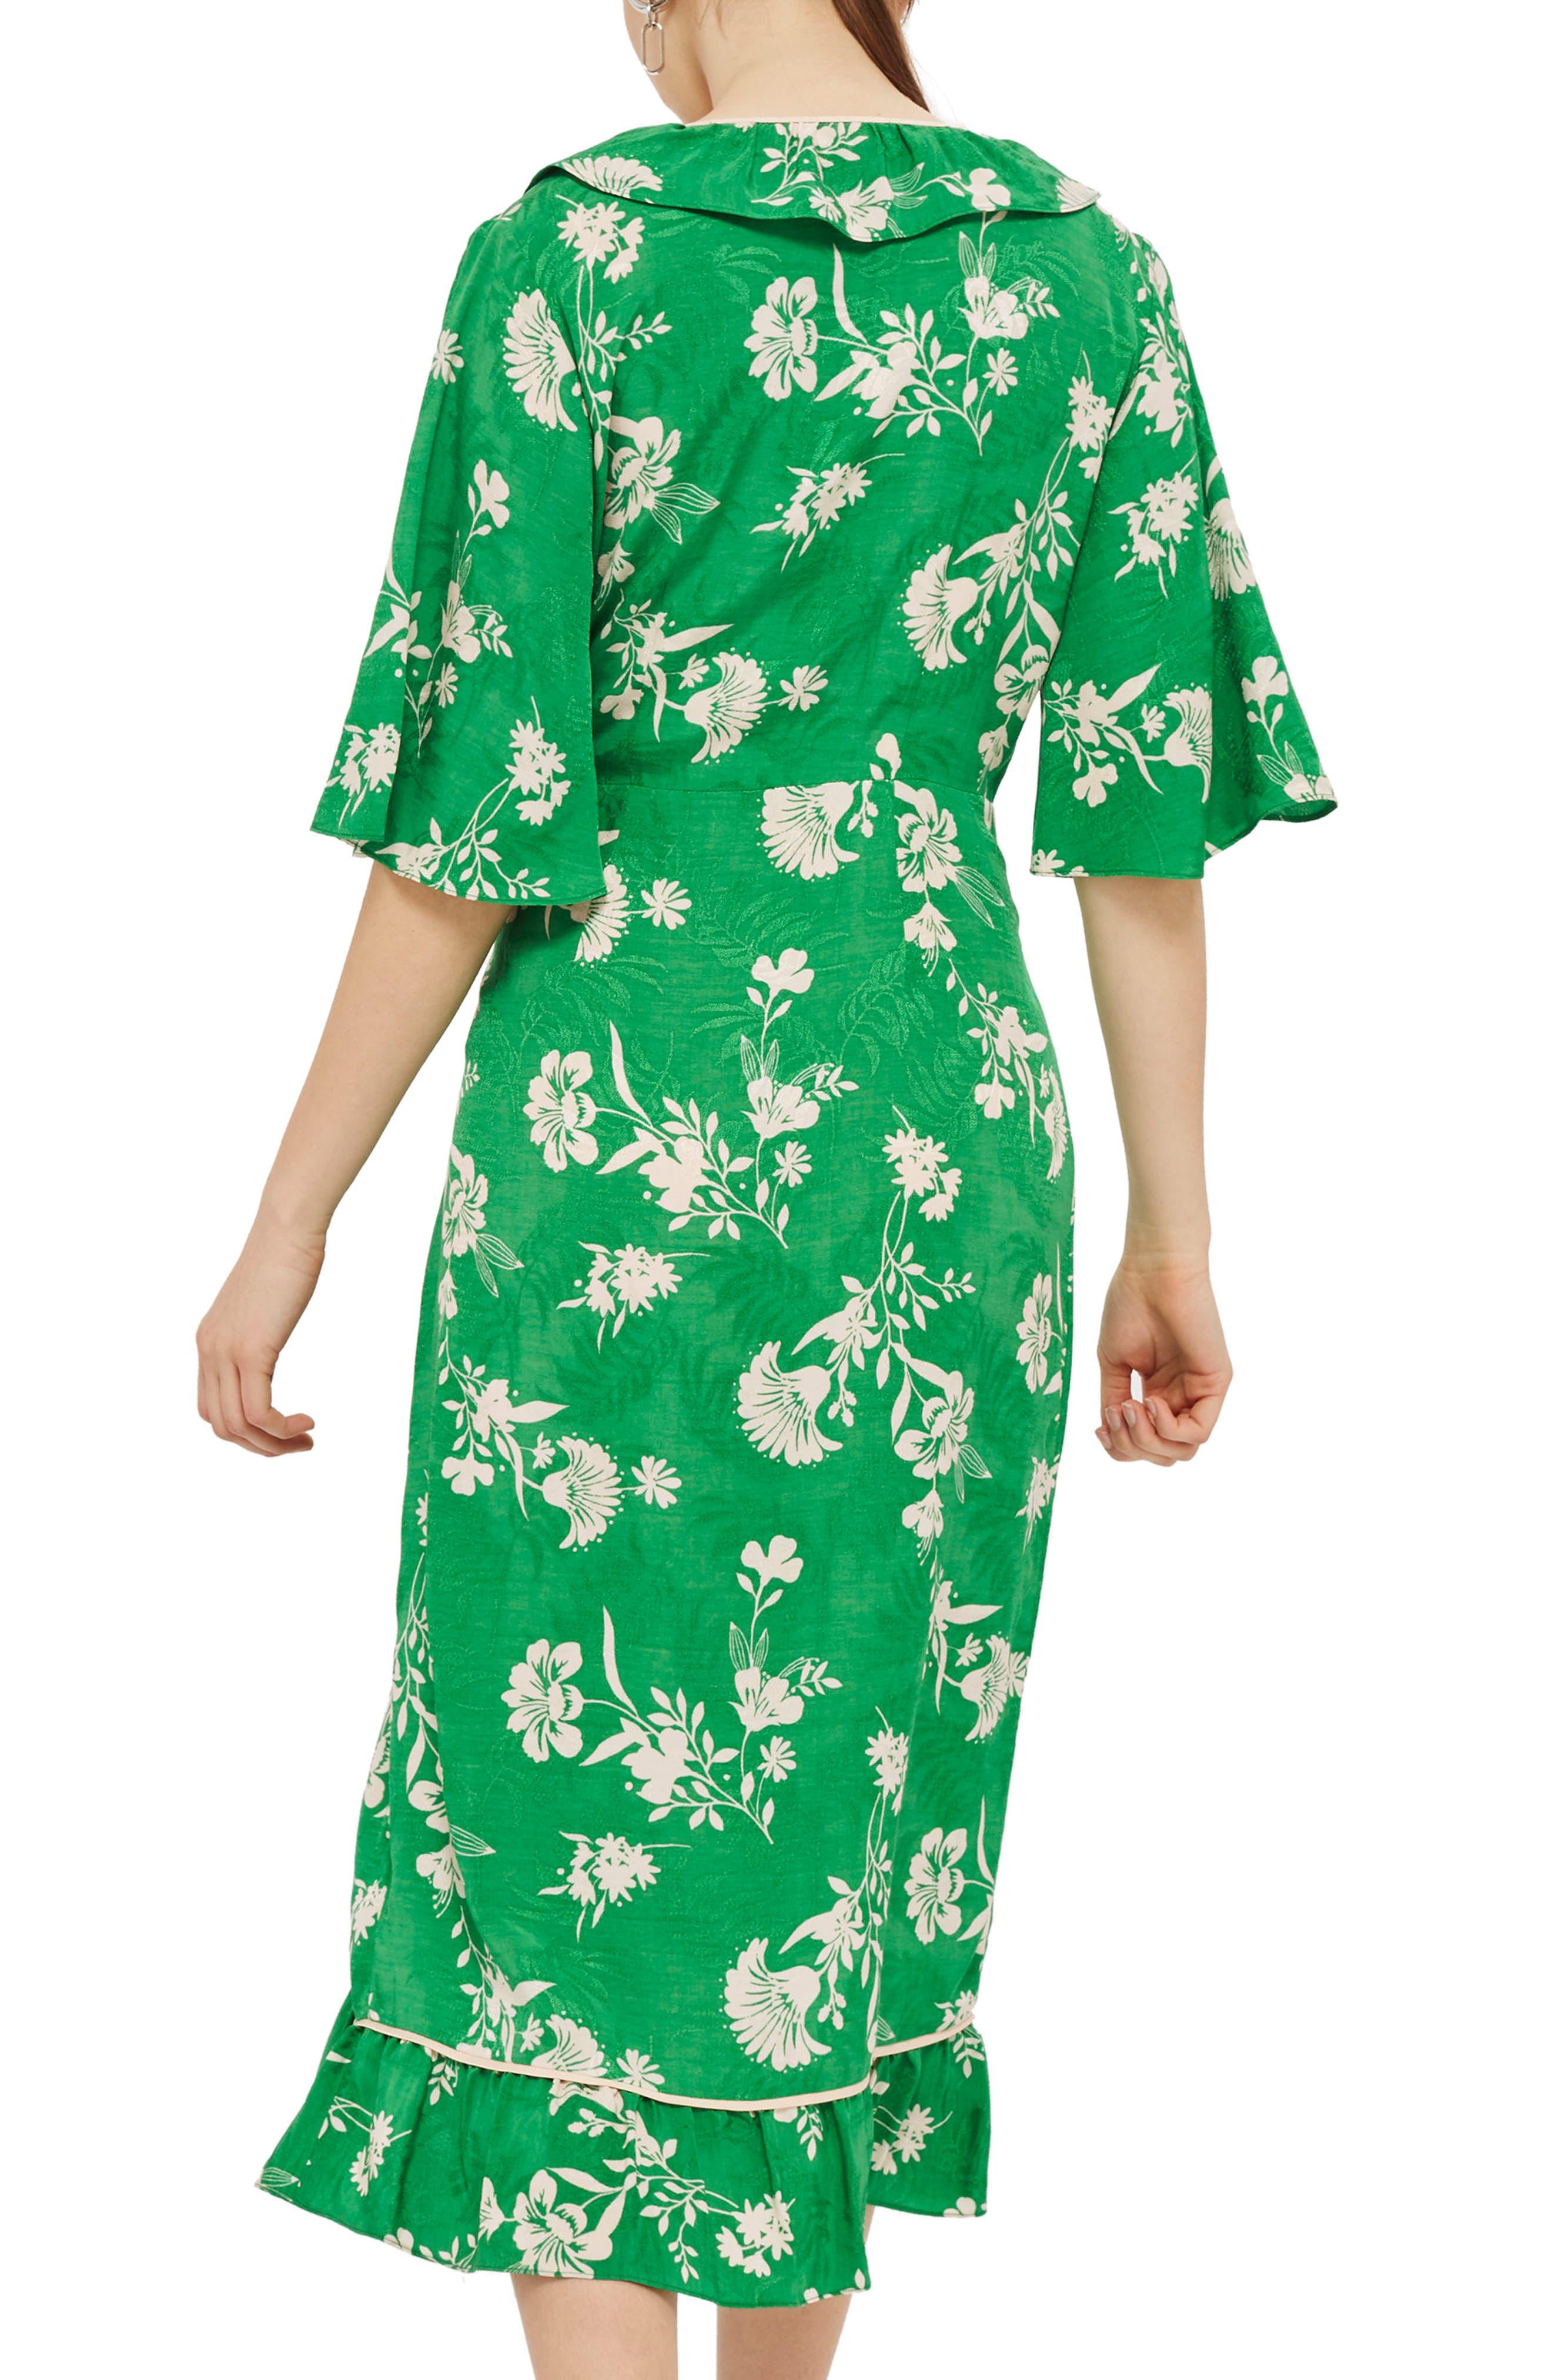 Leaf Print Ruffle Wrap Dress,                             Alternate thumbnail 2, color,                             Green